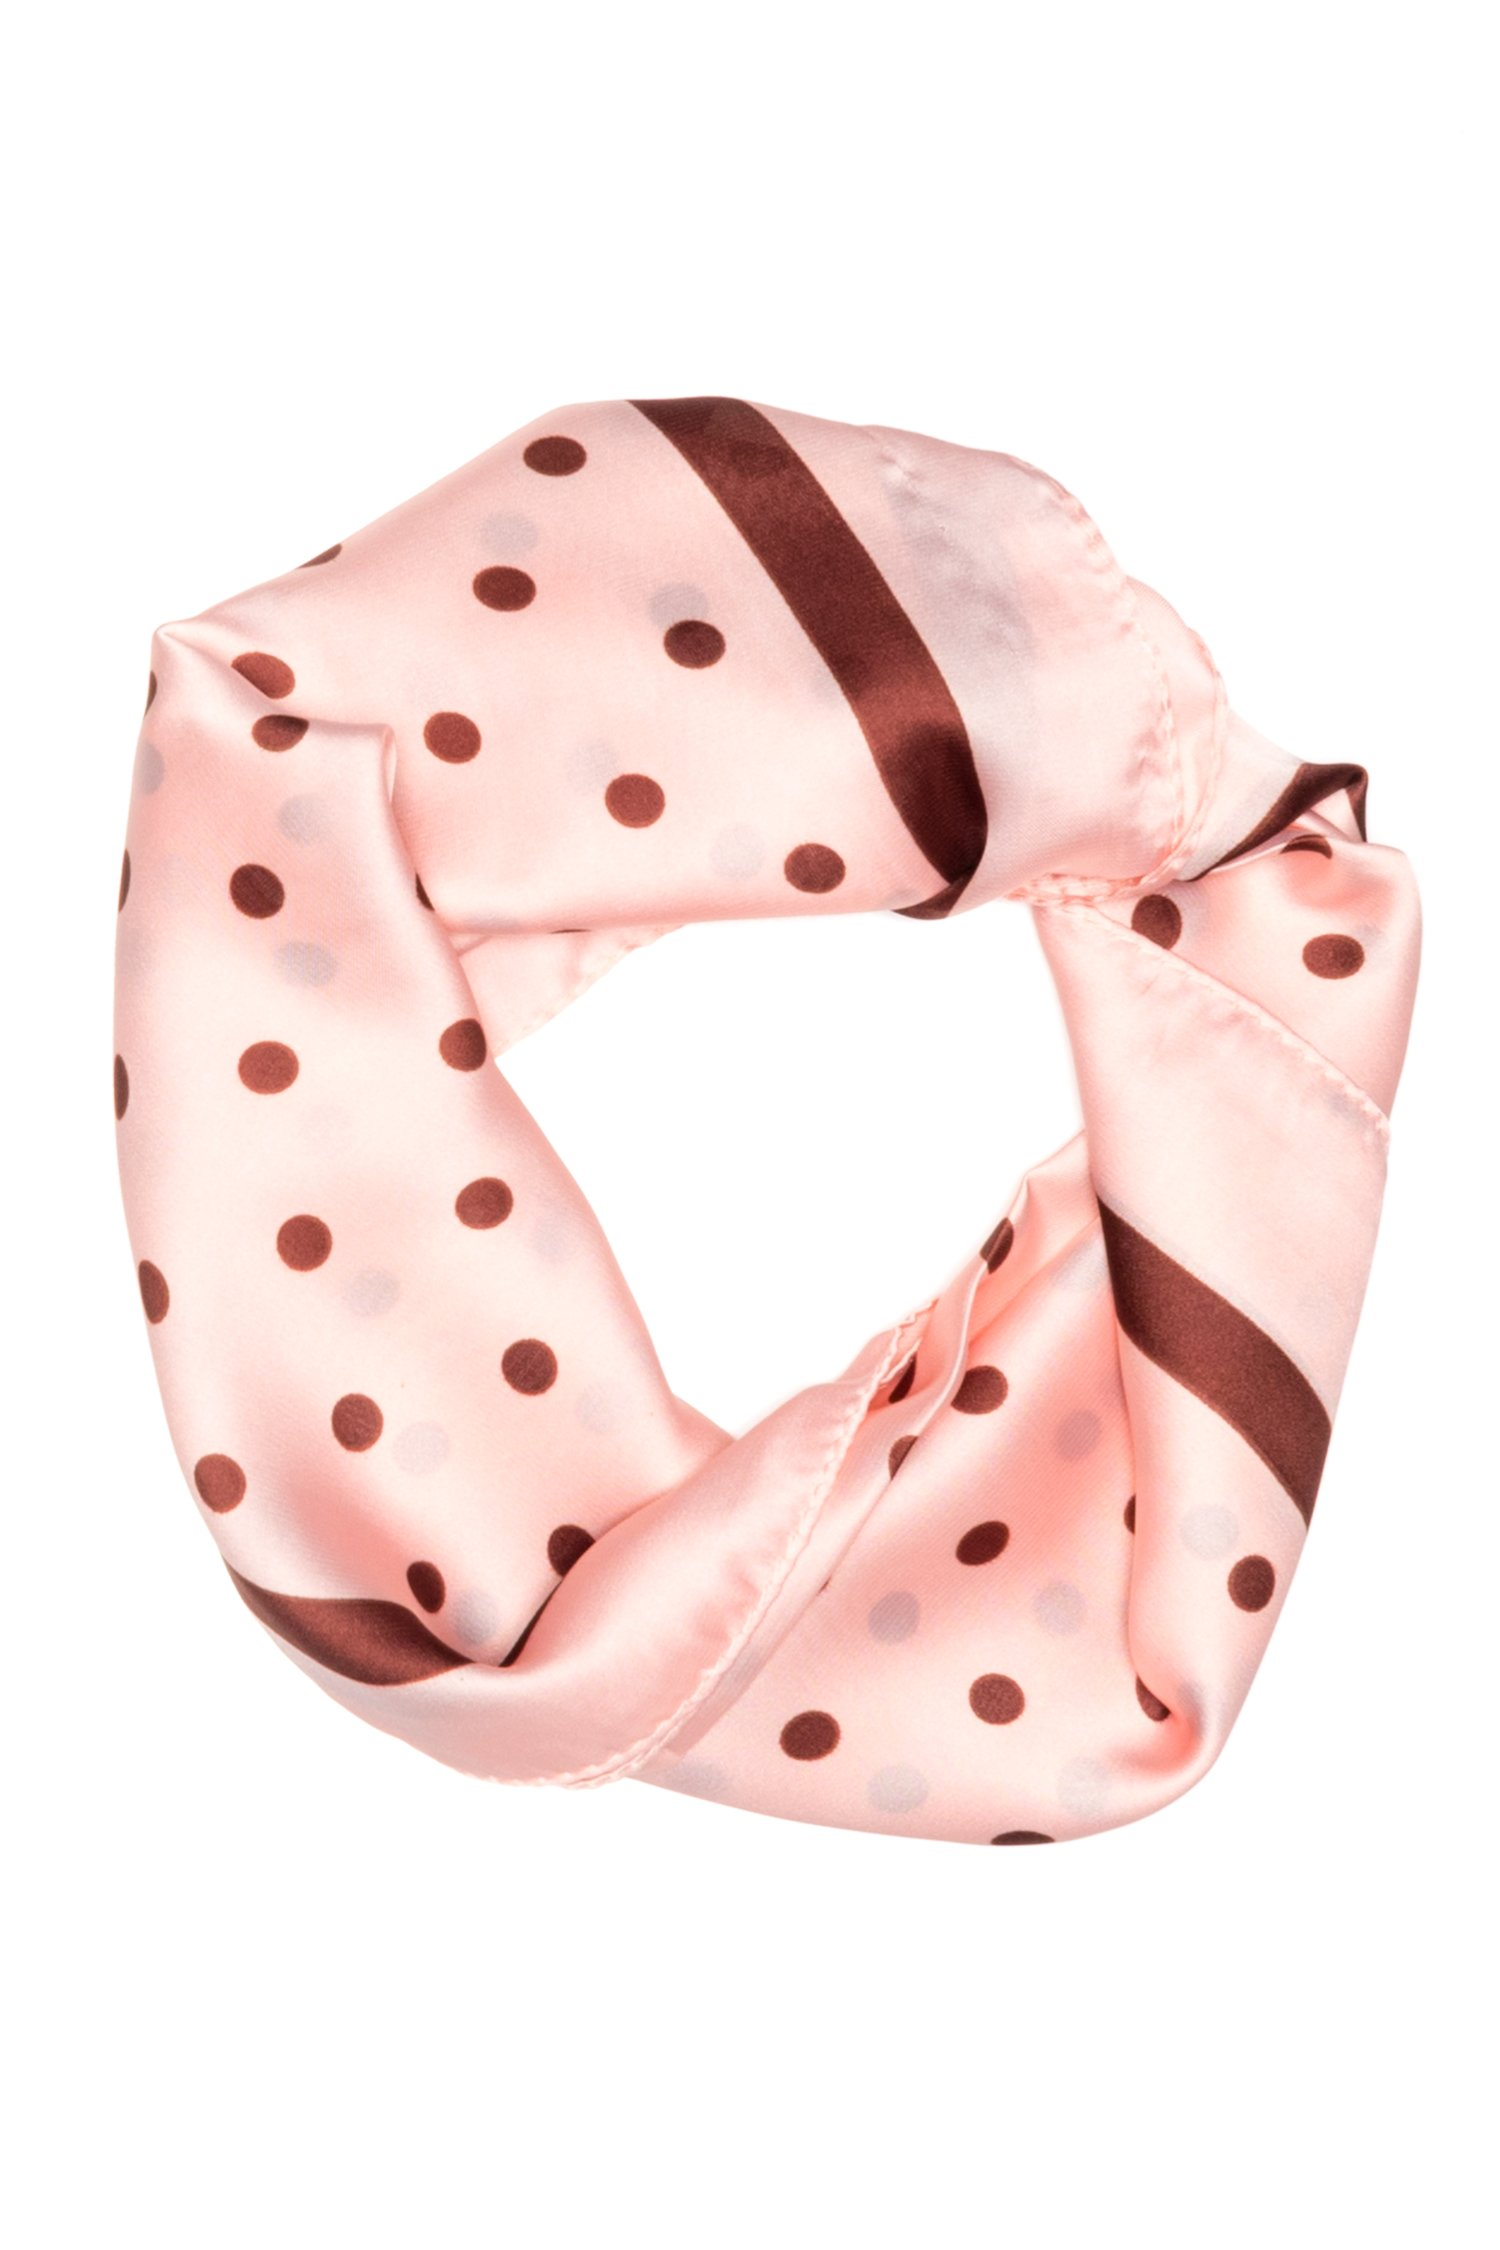 Esarfa patrata roz cu buline maro